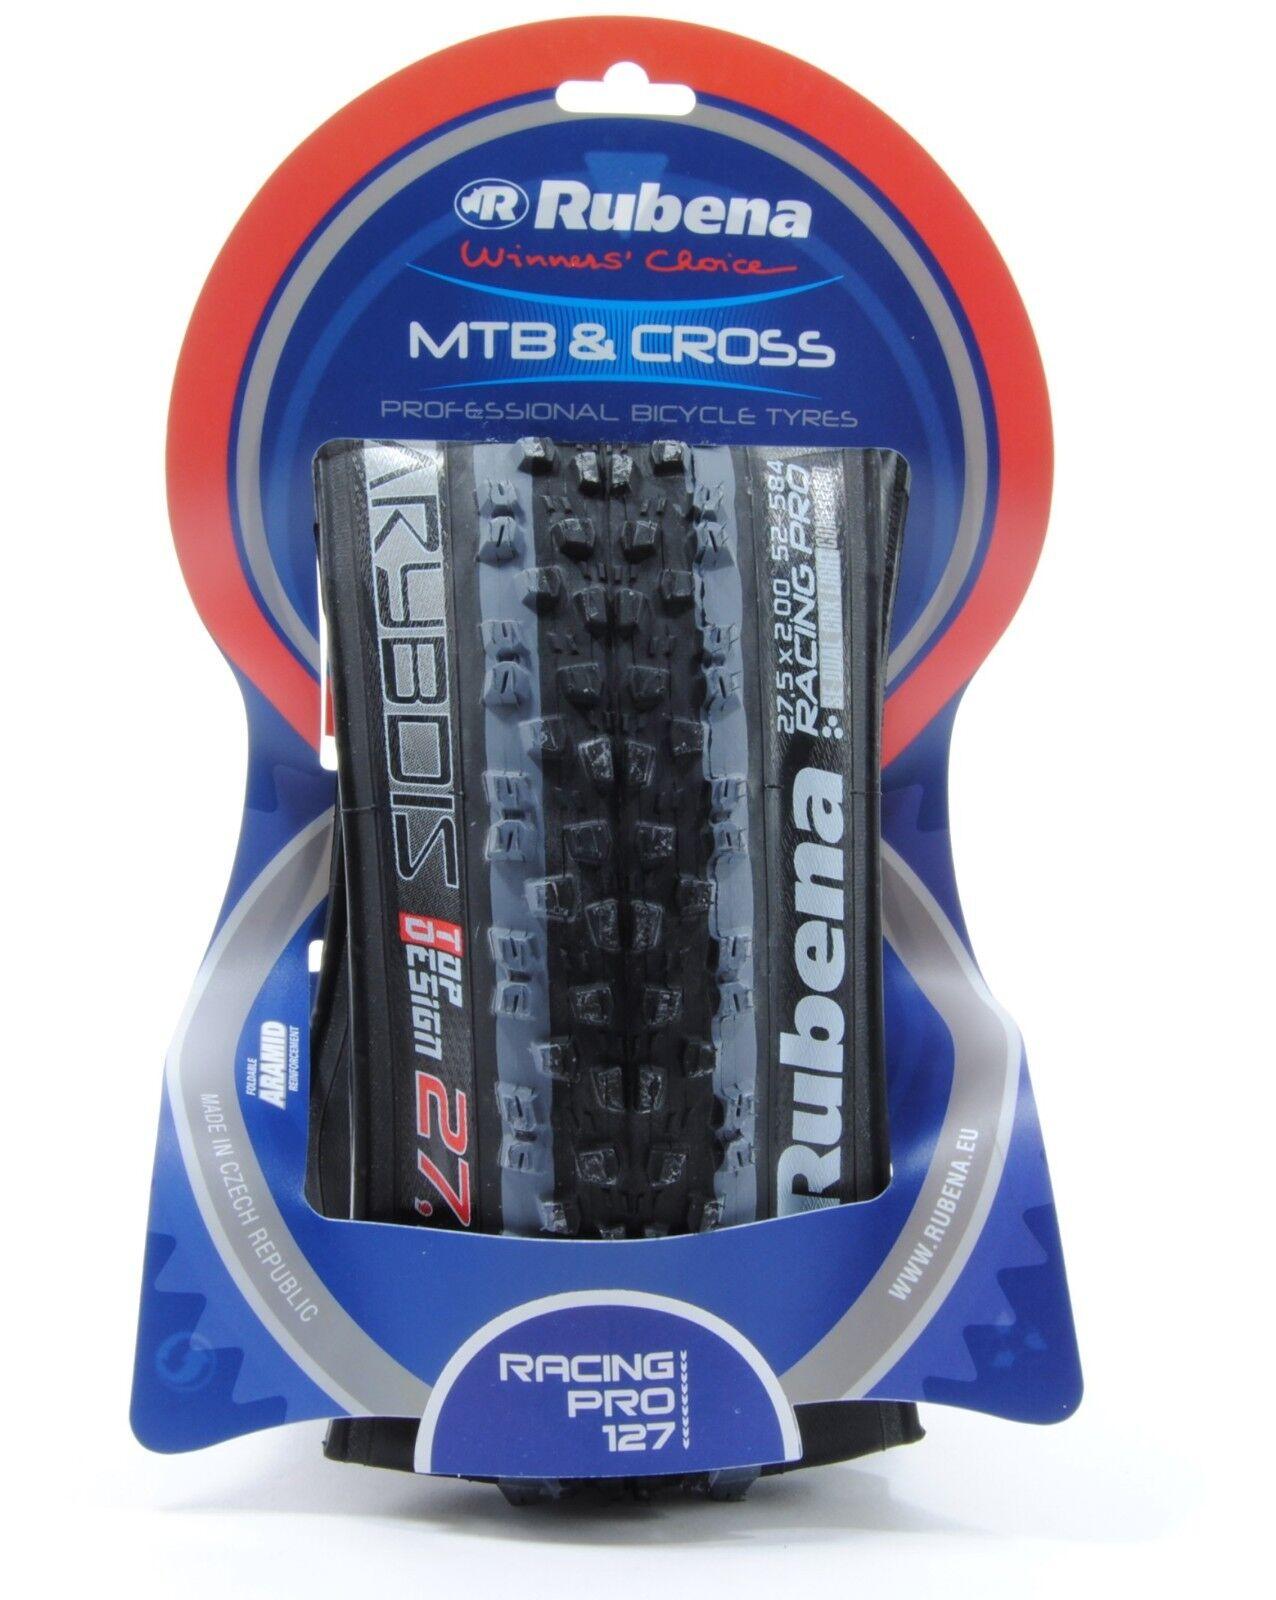 Rubena Racing Pro 650B Folding Mountain Bike Tire 27.5 x 2.0 27.5x2.0 520 GRAMS